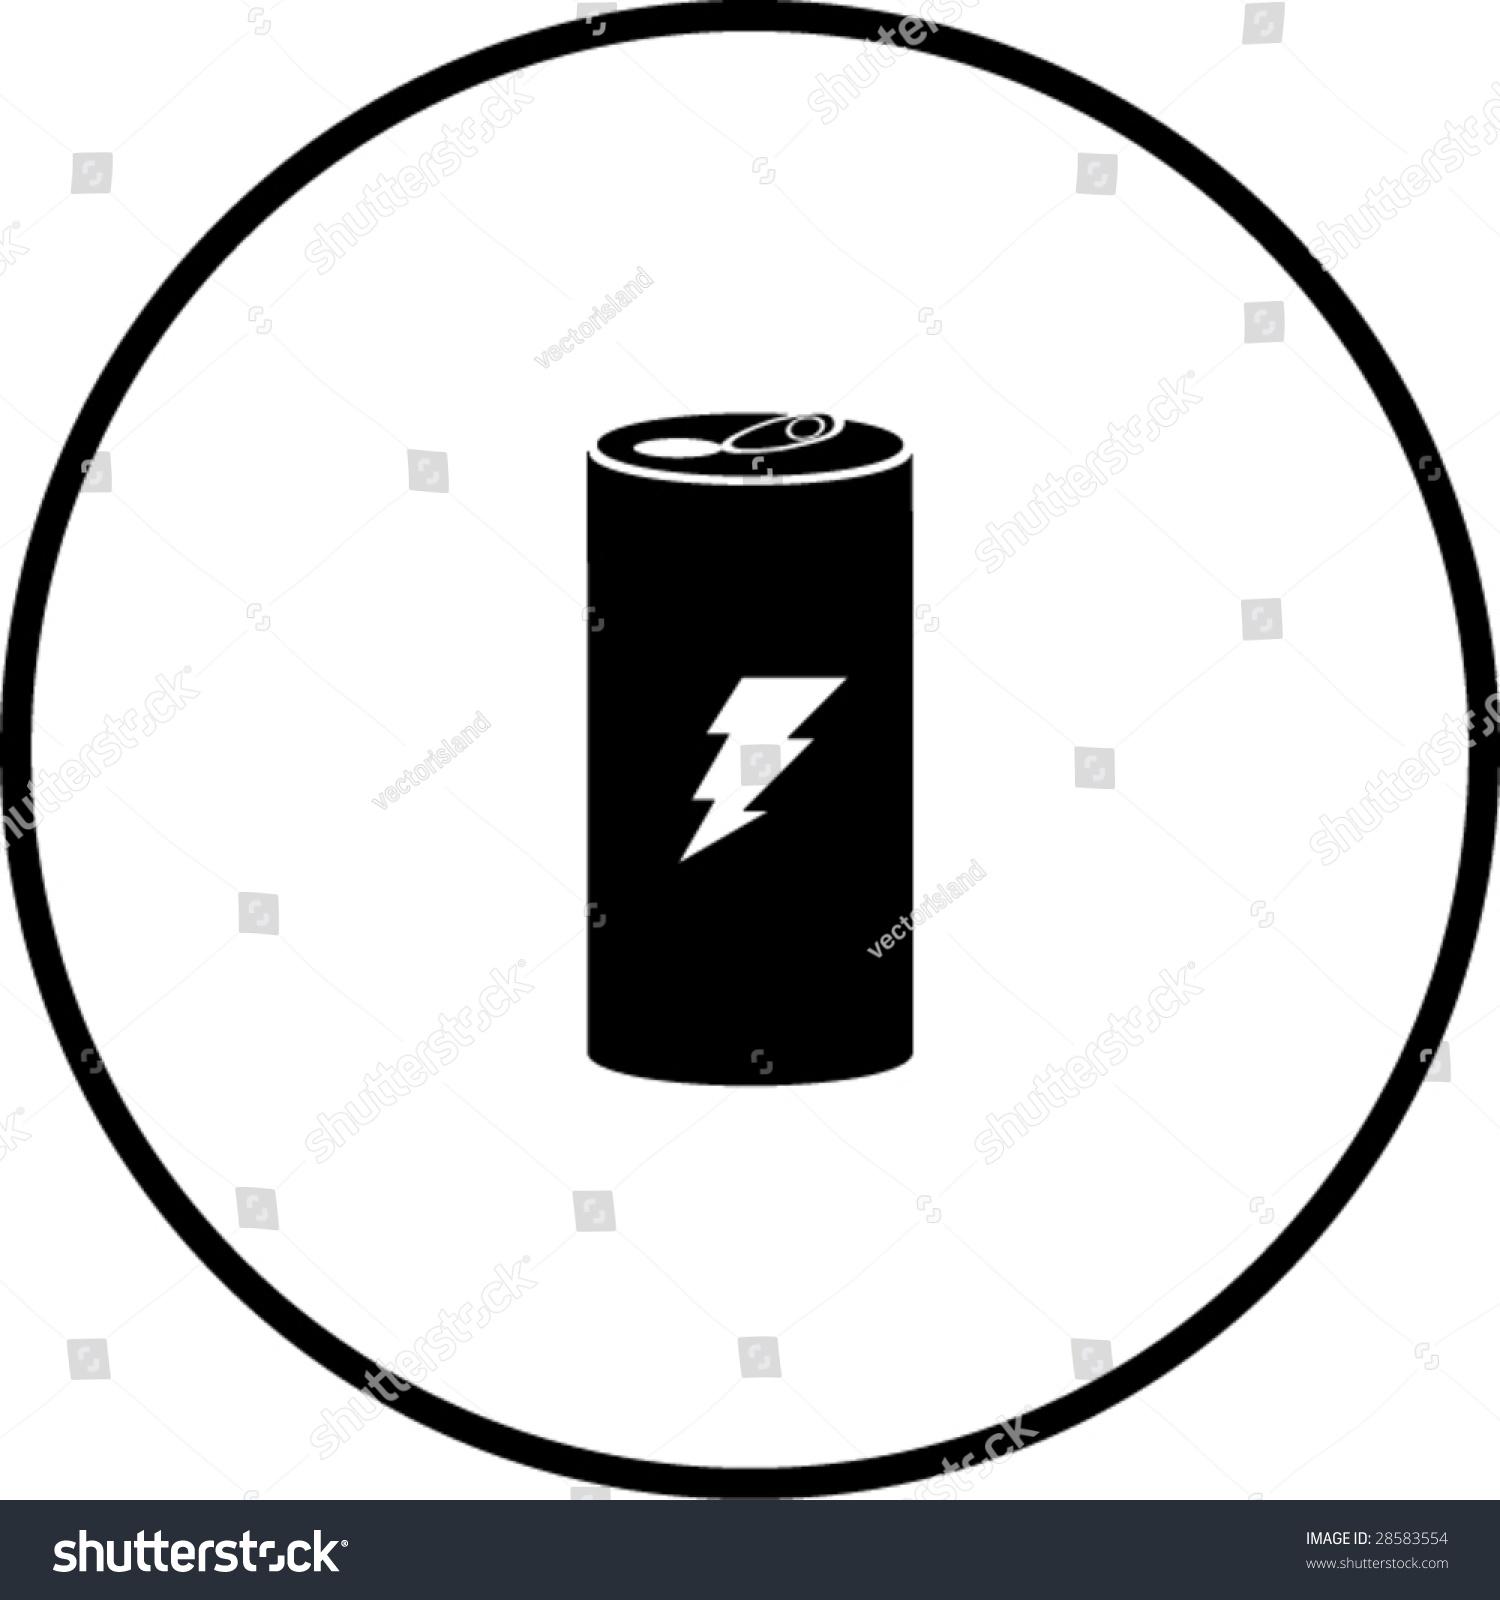 Energy Drink Symbol Stock Vector Illustration 28583554 ...